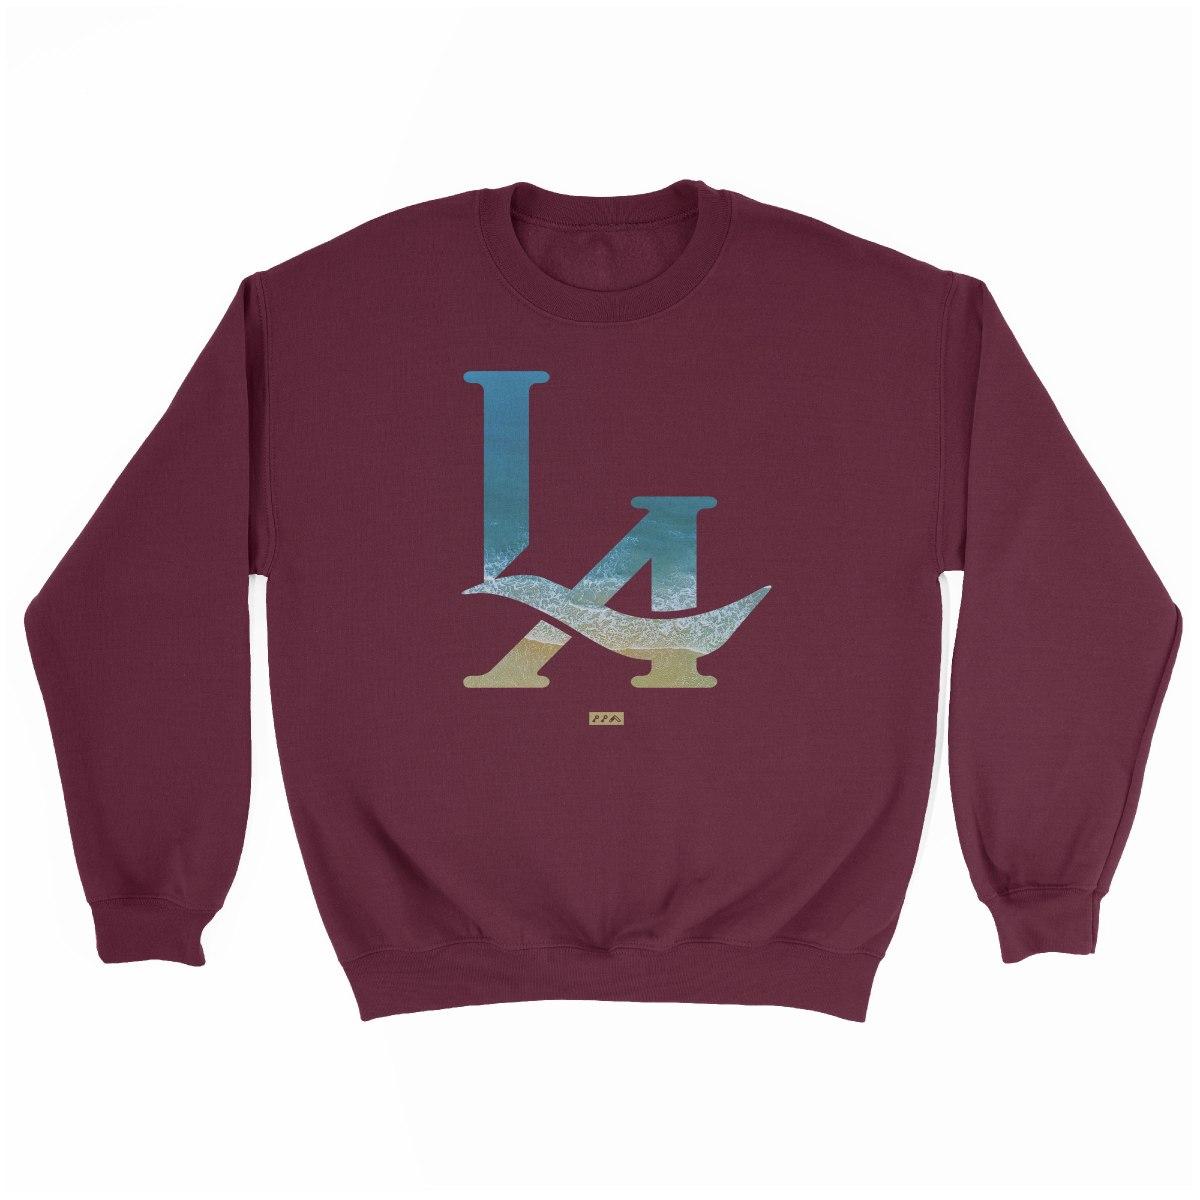 LA logo los angeles hermosa beach sweatshirt in maroon at kikicutt.com